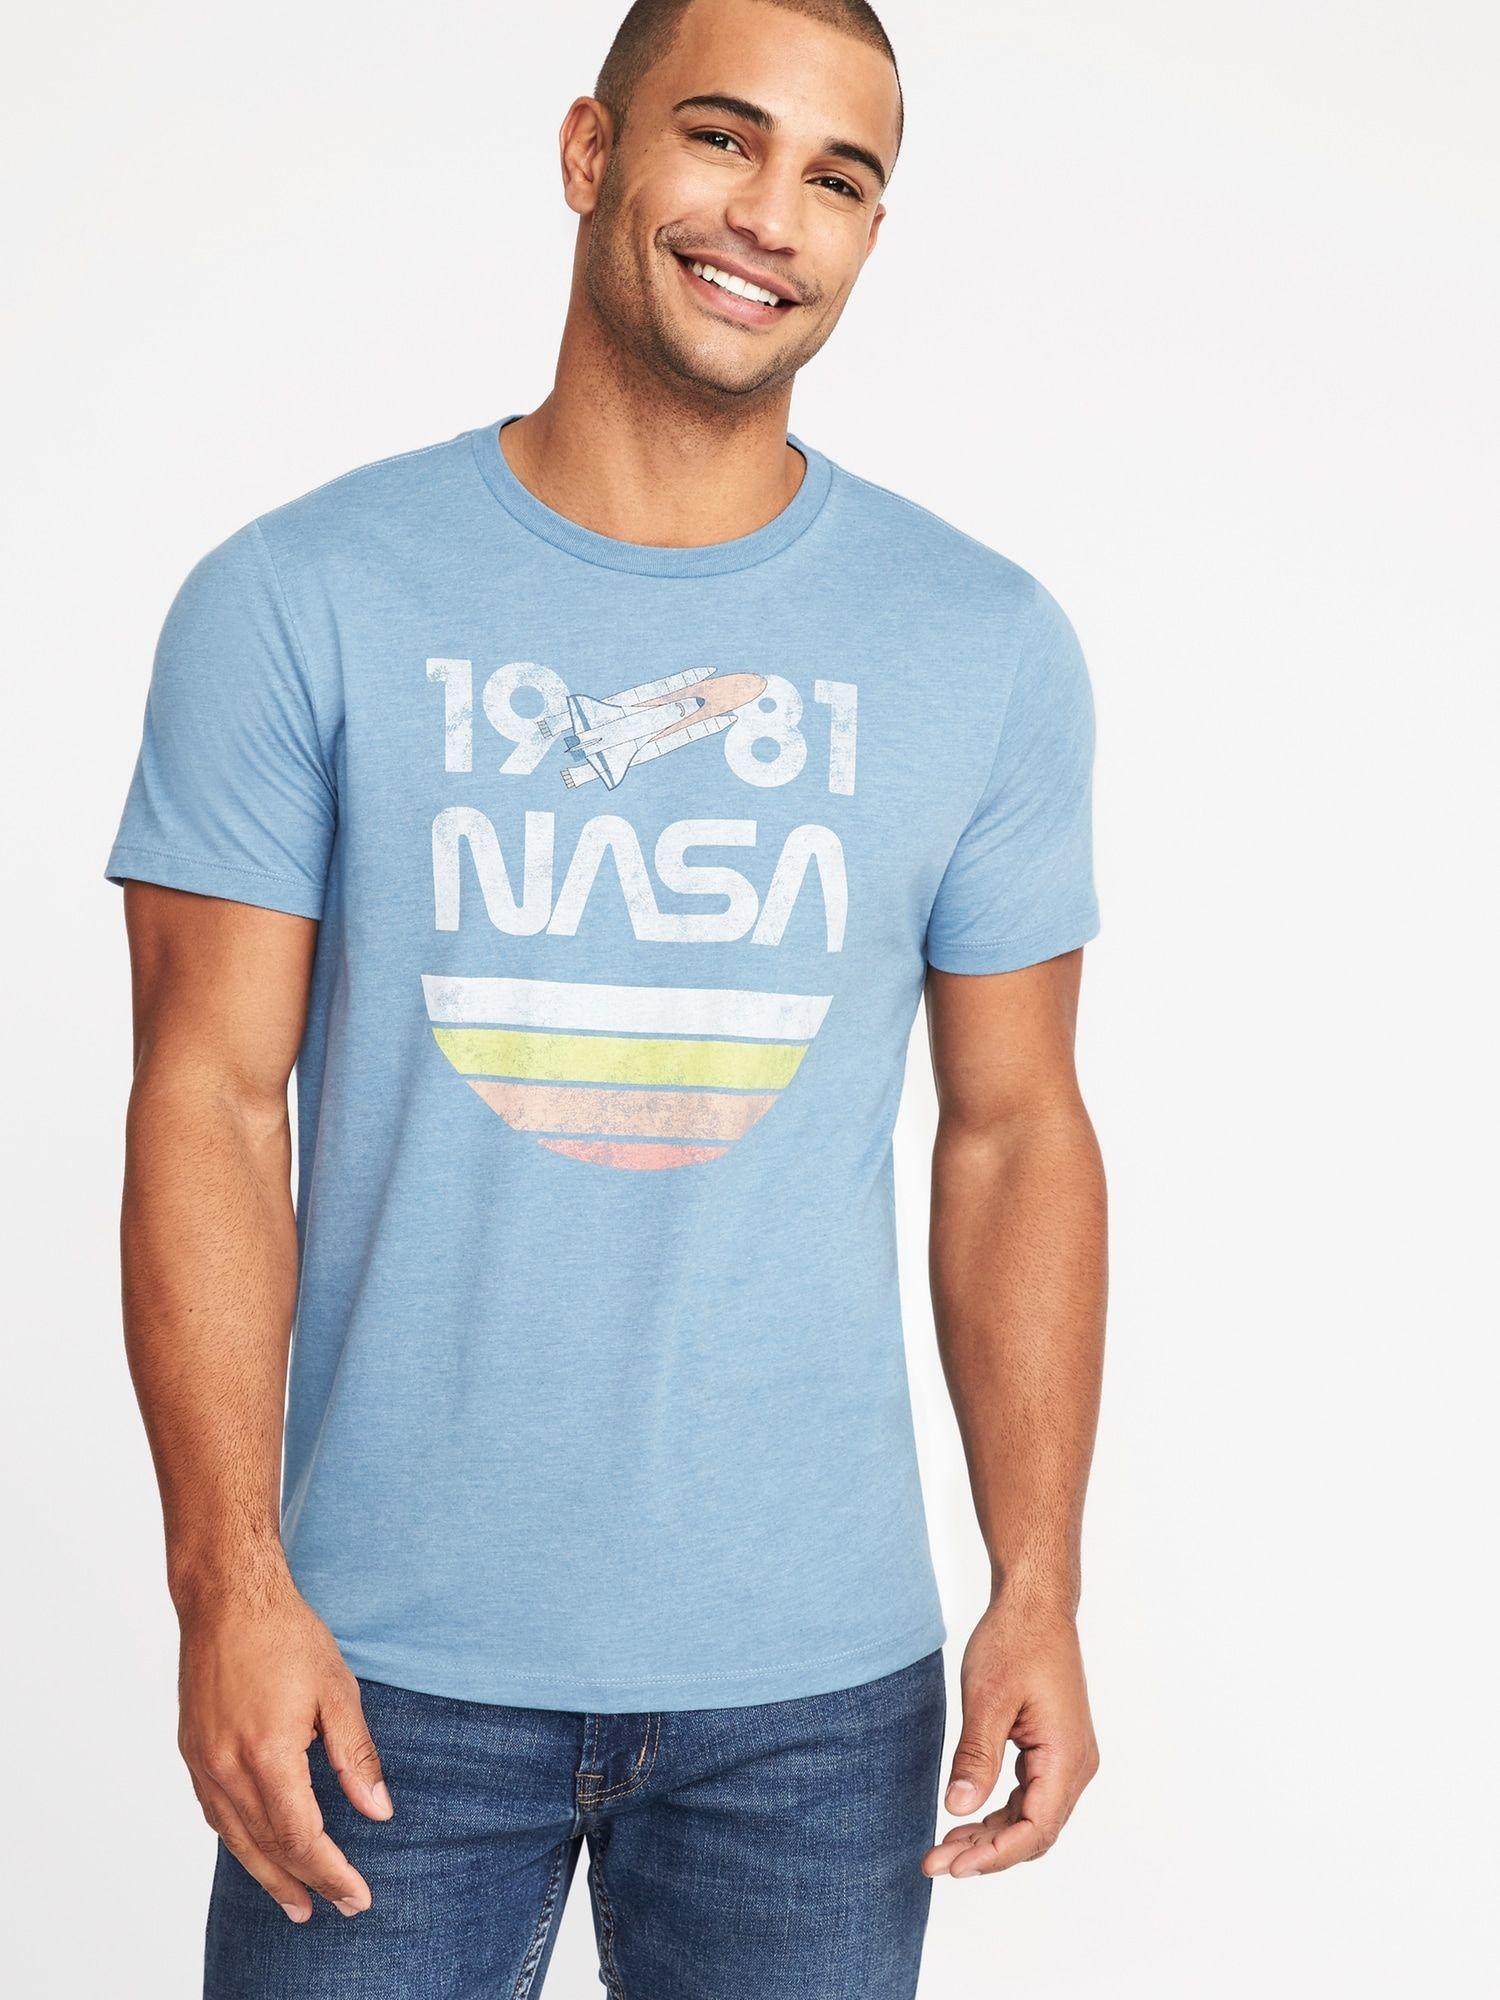 NASA® Retro-Graphic Tee for Men  3293fab69